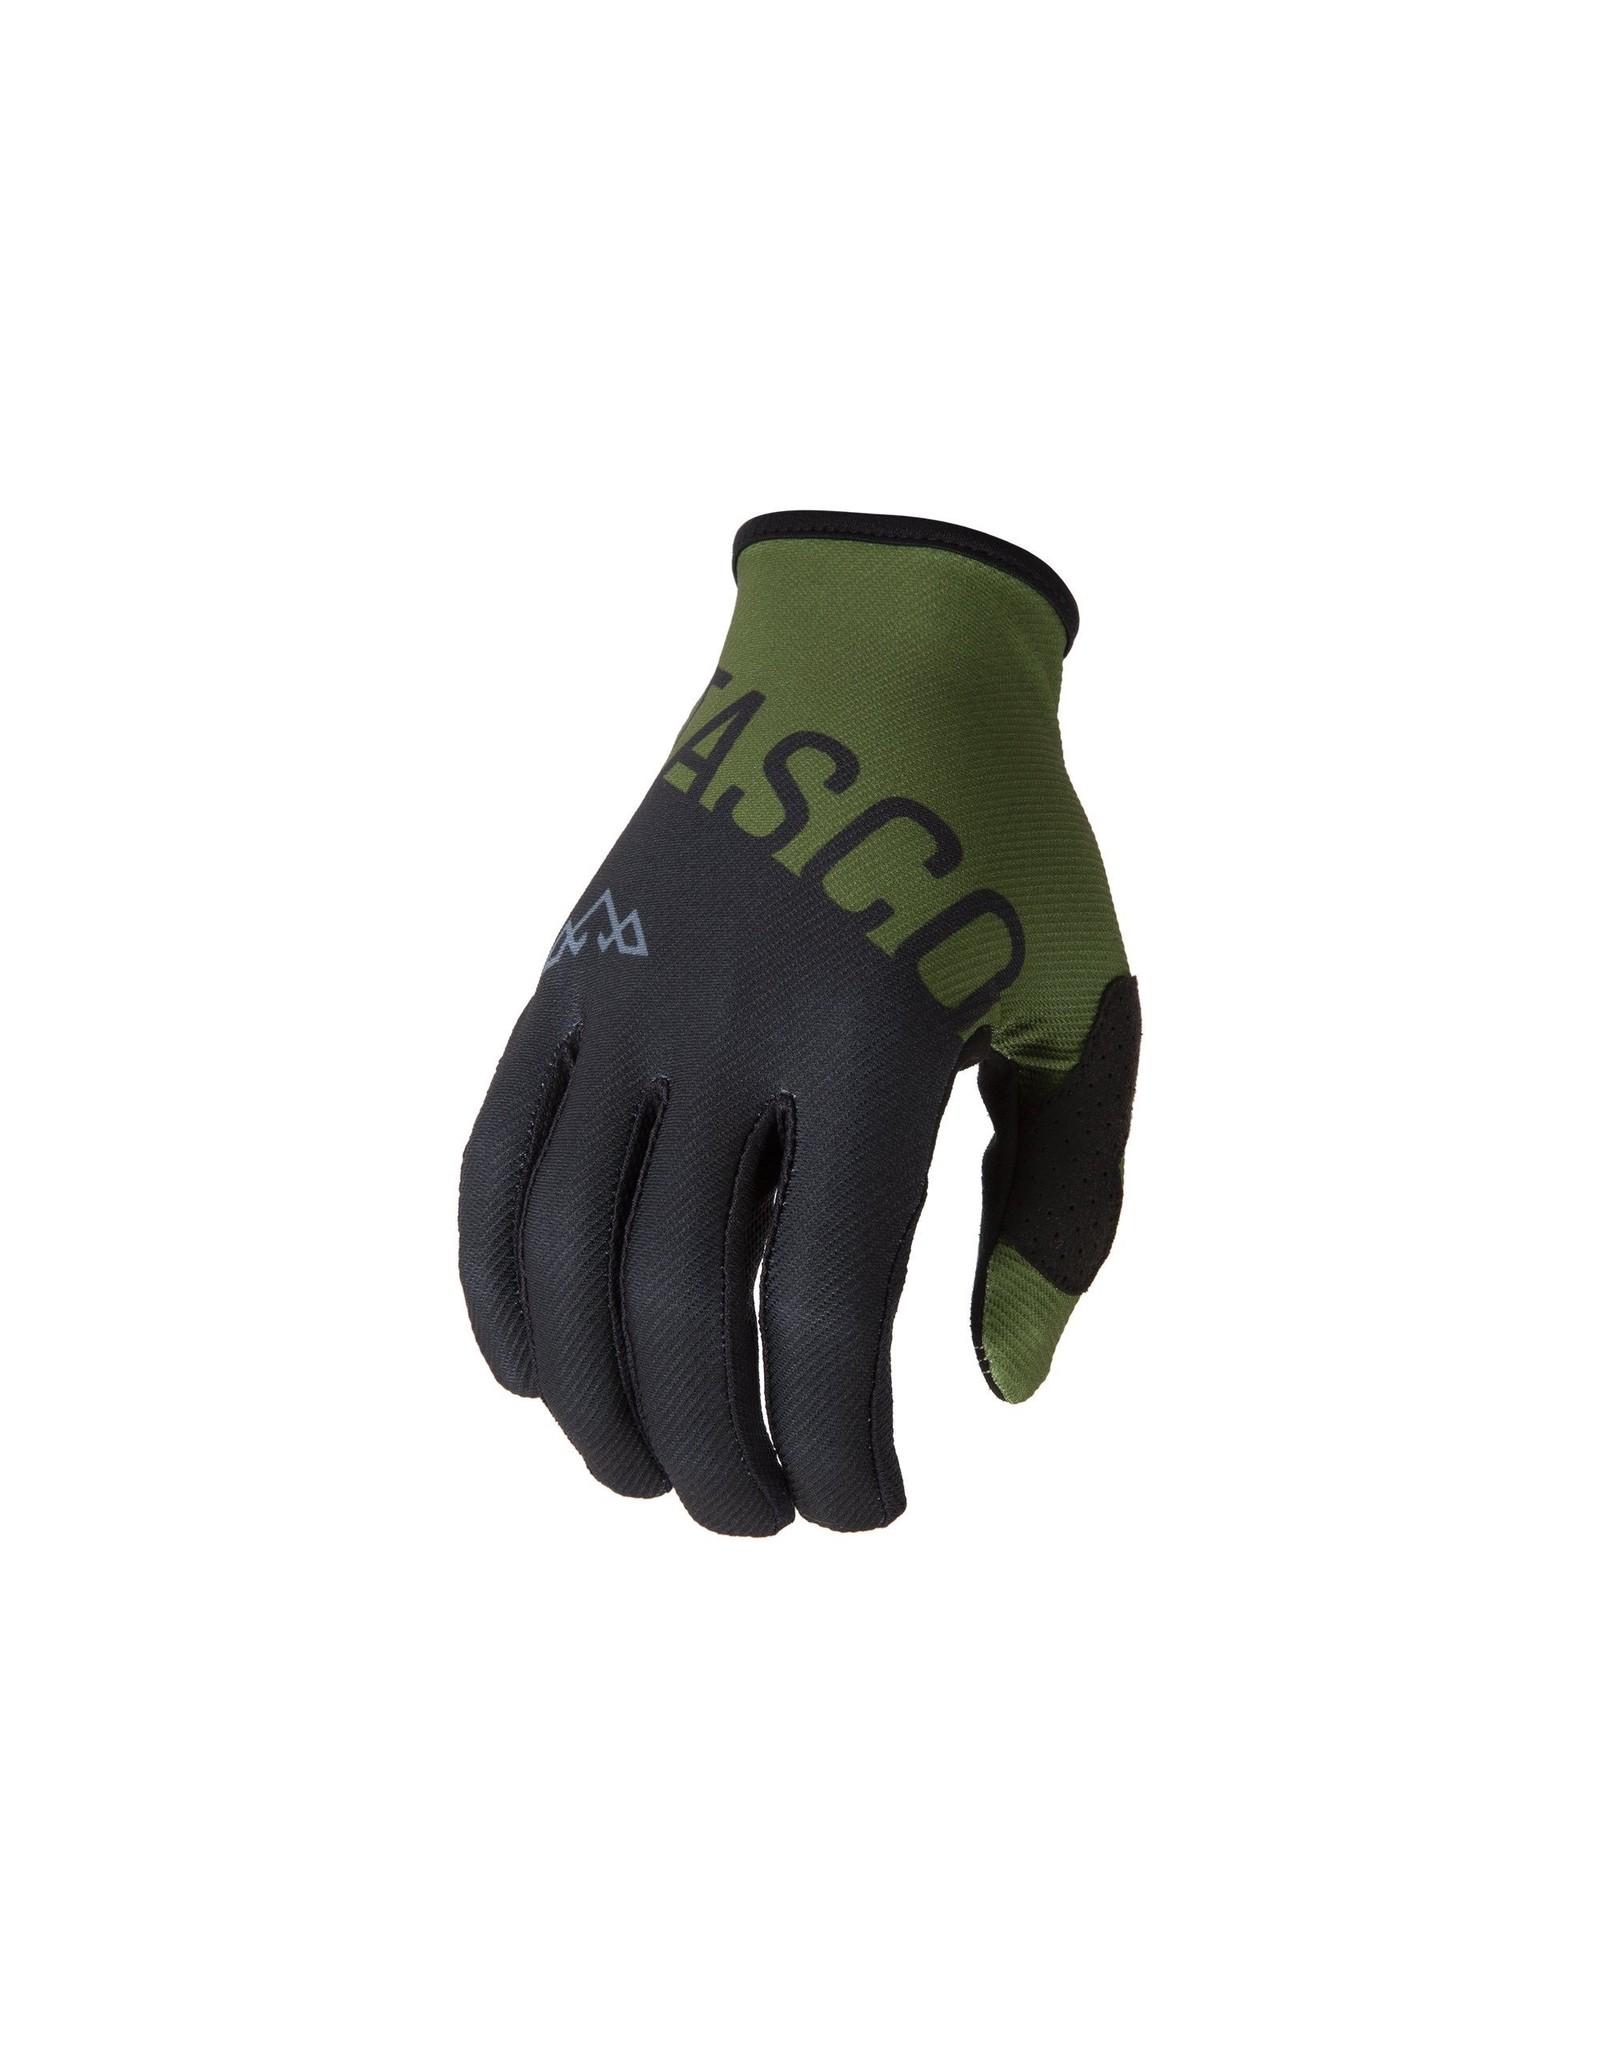 Tasco MTB Split Double Digits MTB Gloves (Olive)